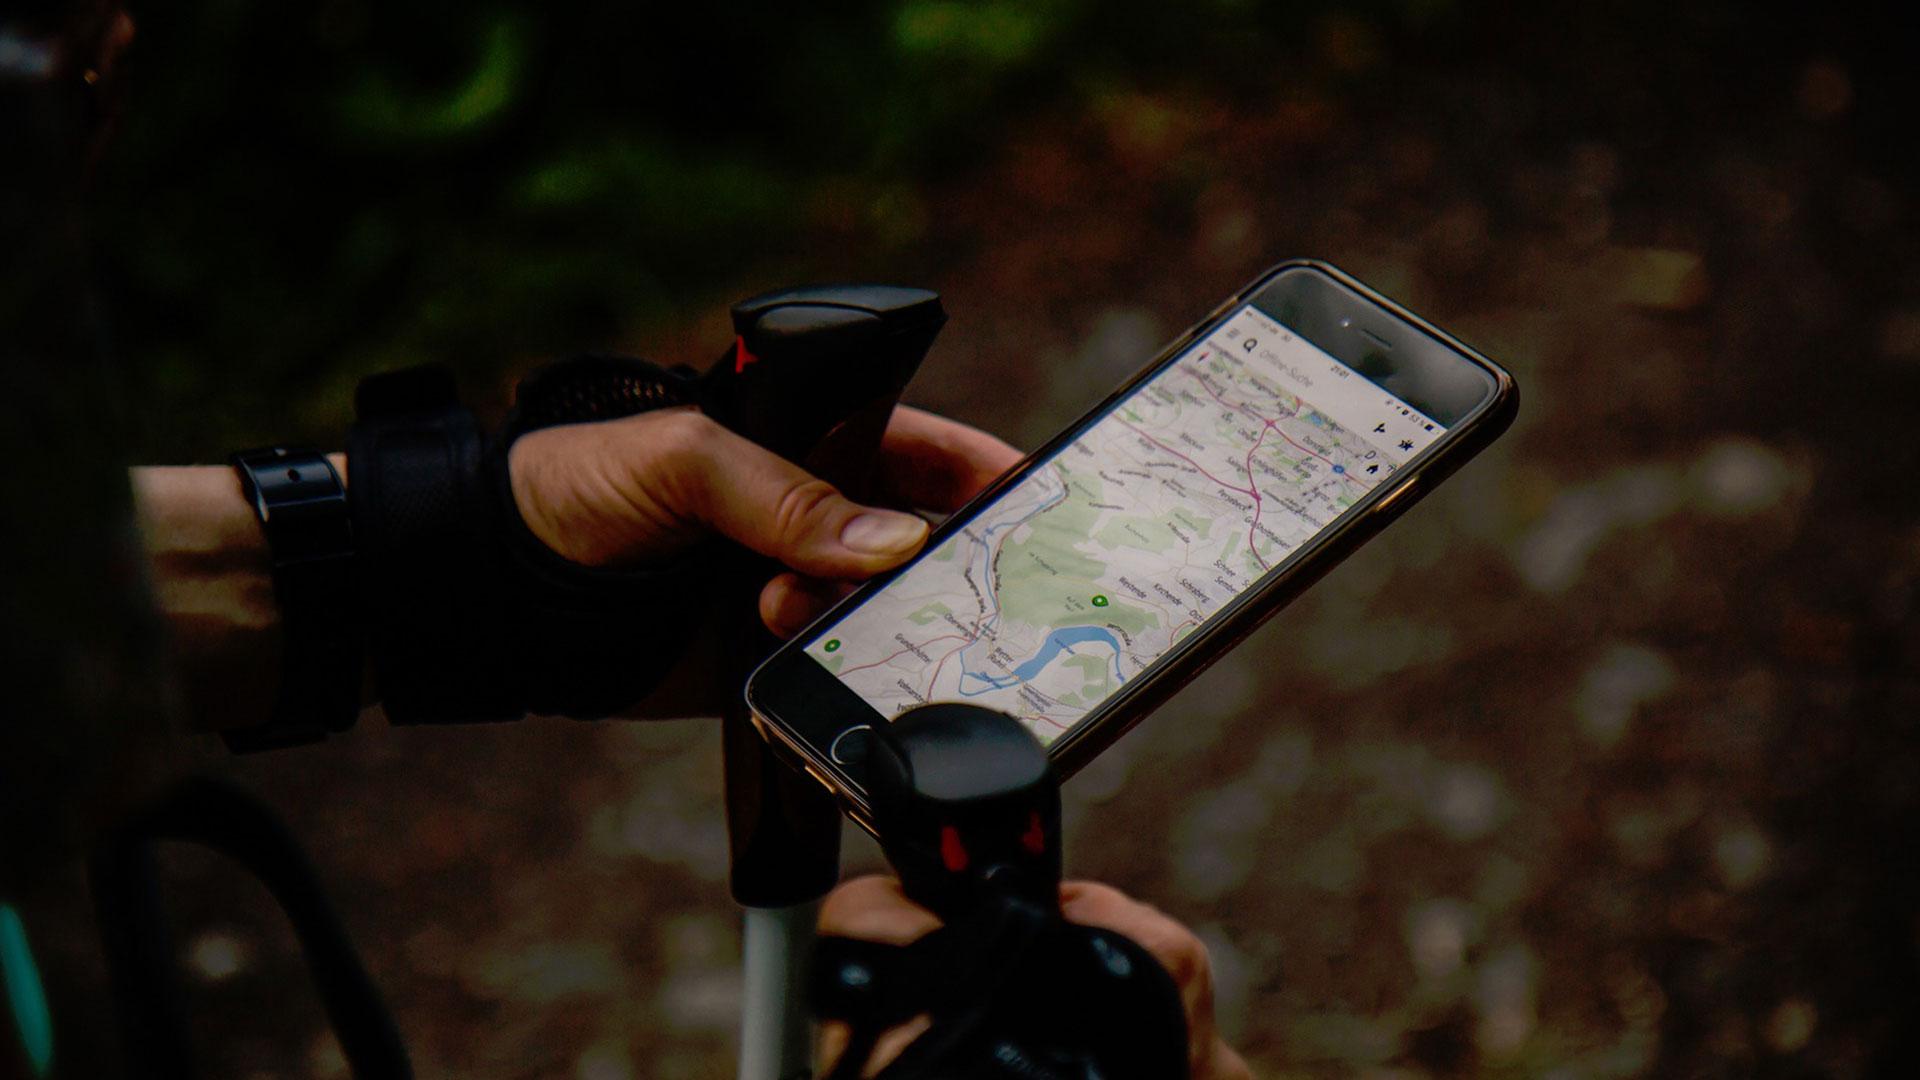 Interaktive Karten Smartphone